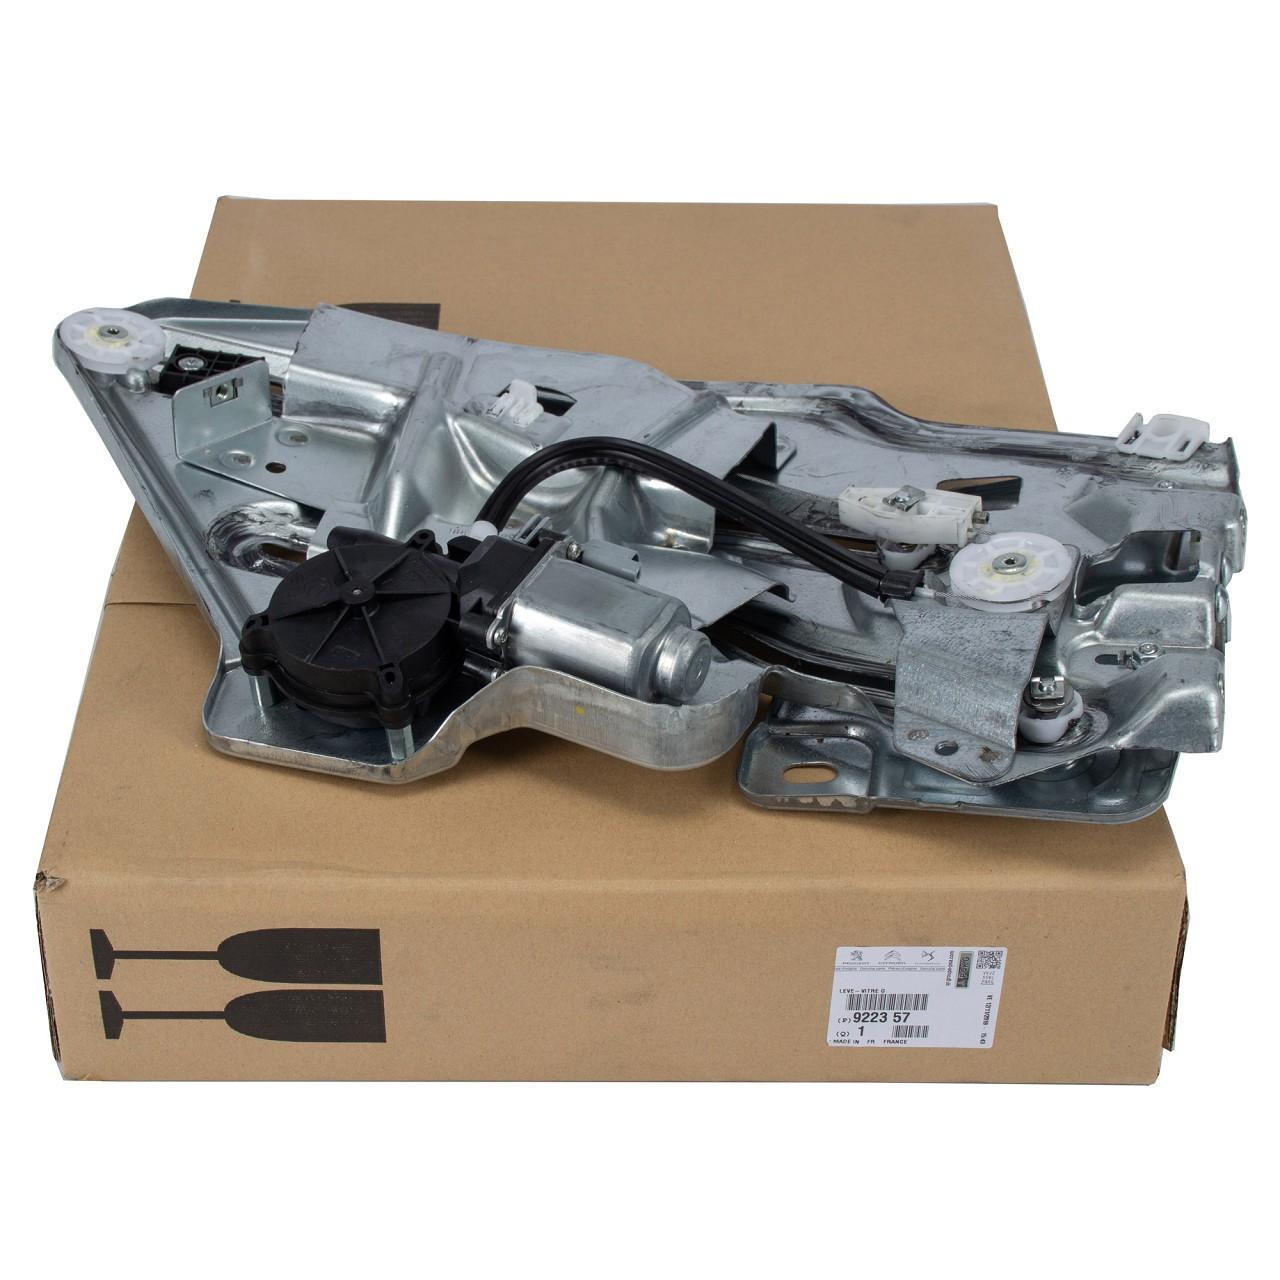 ORIGINAL Peugeot Fensterheber elektrisch + Motor 206 CC 2D hinten links 9223.57